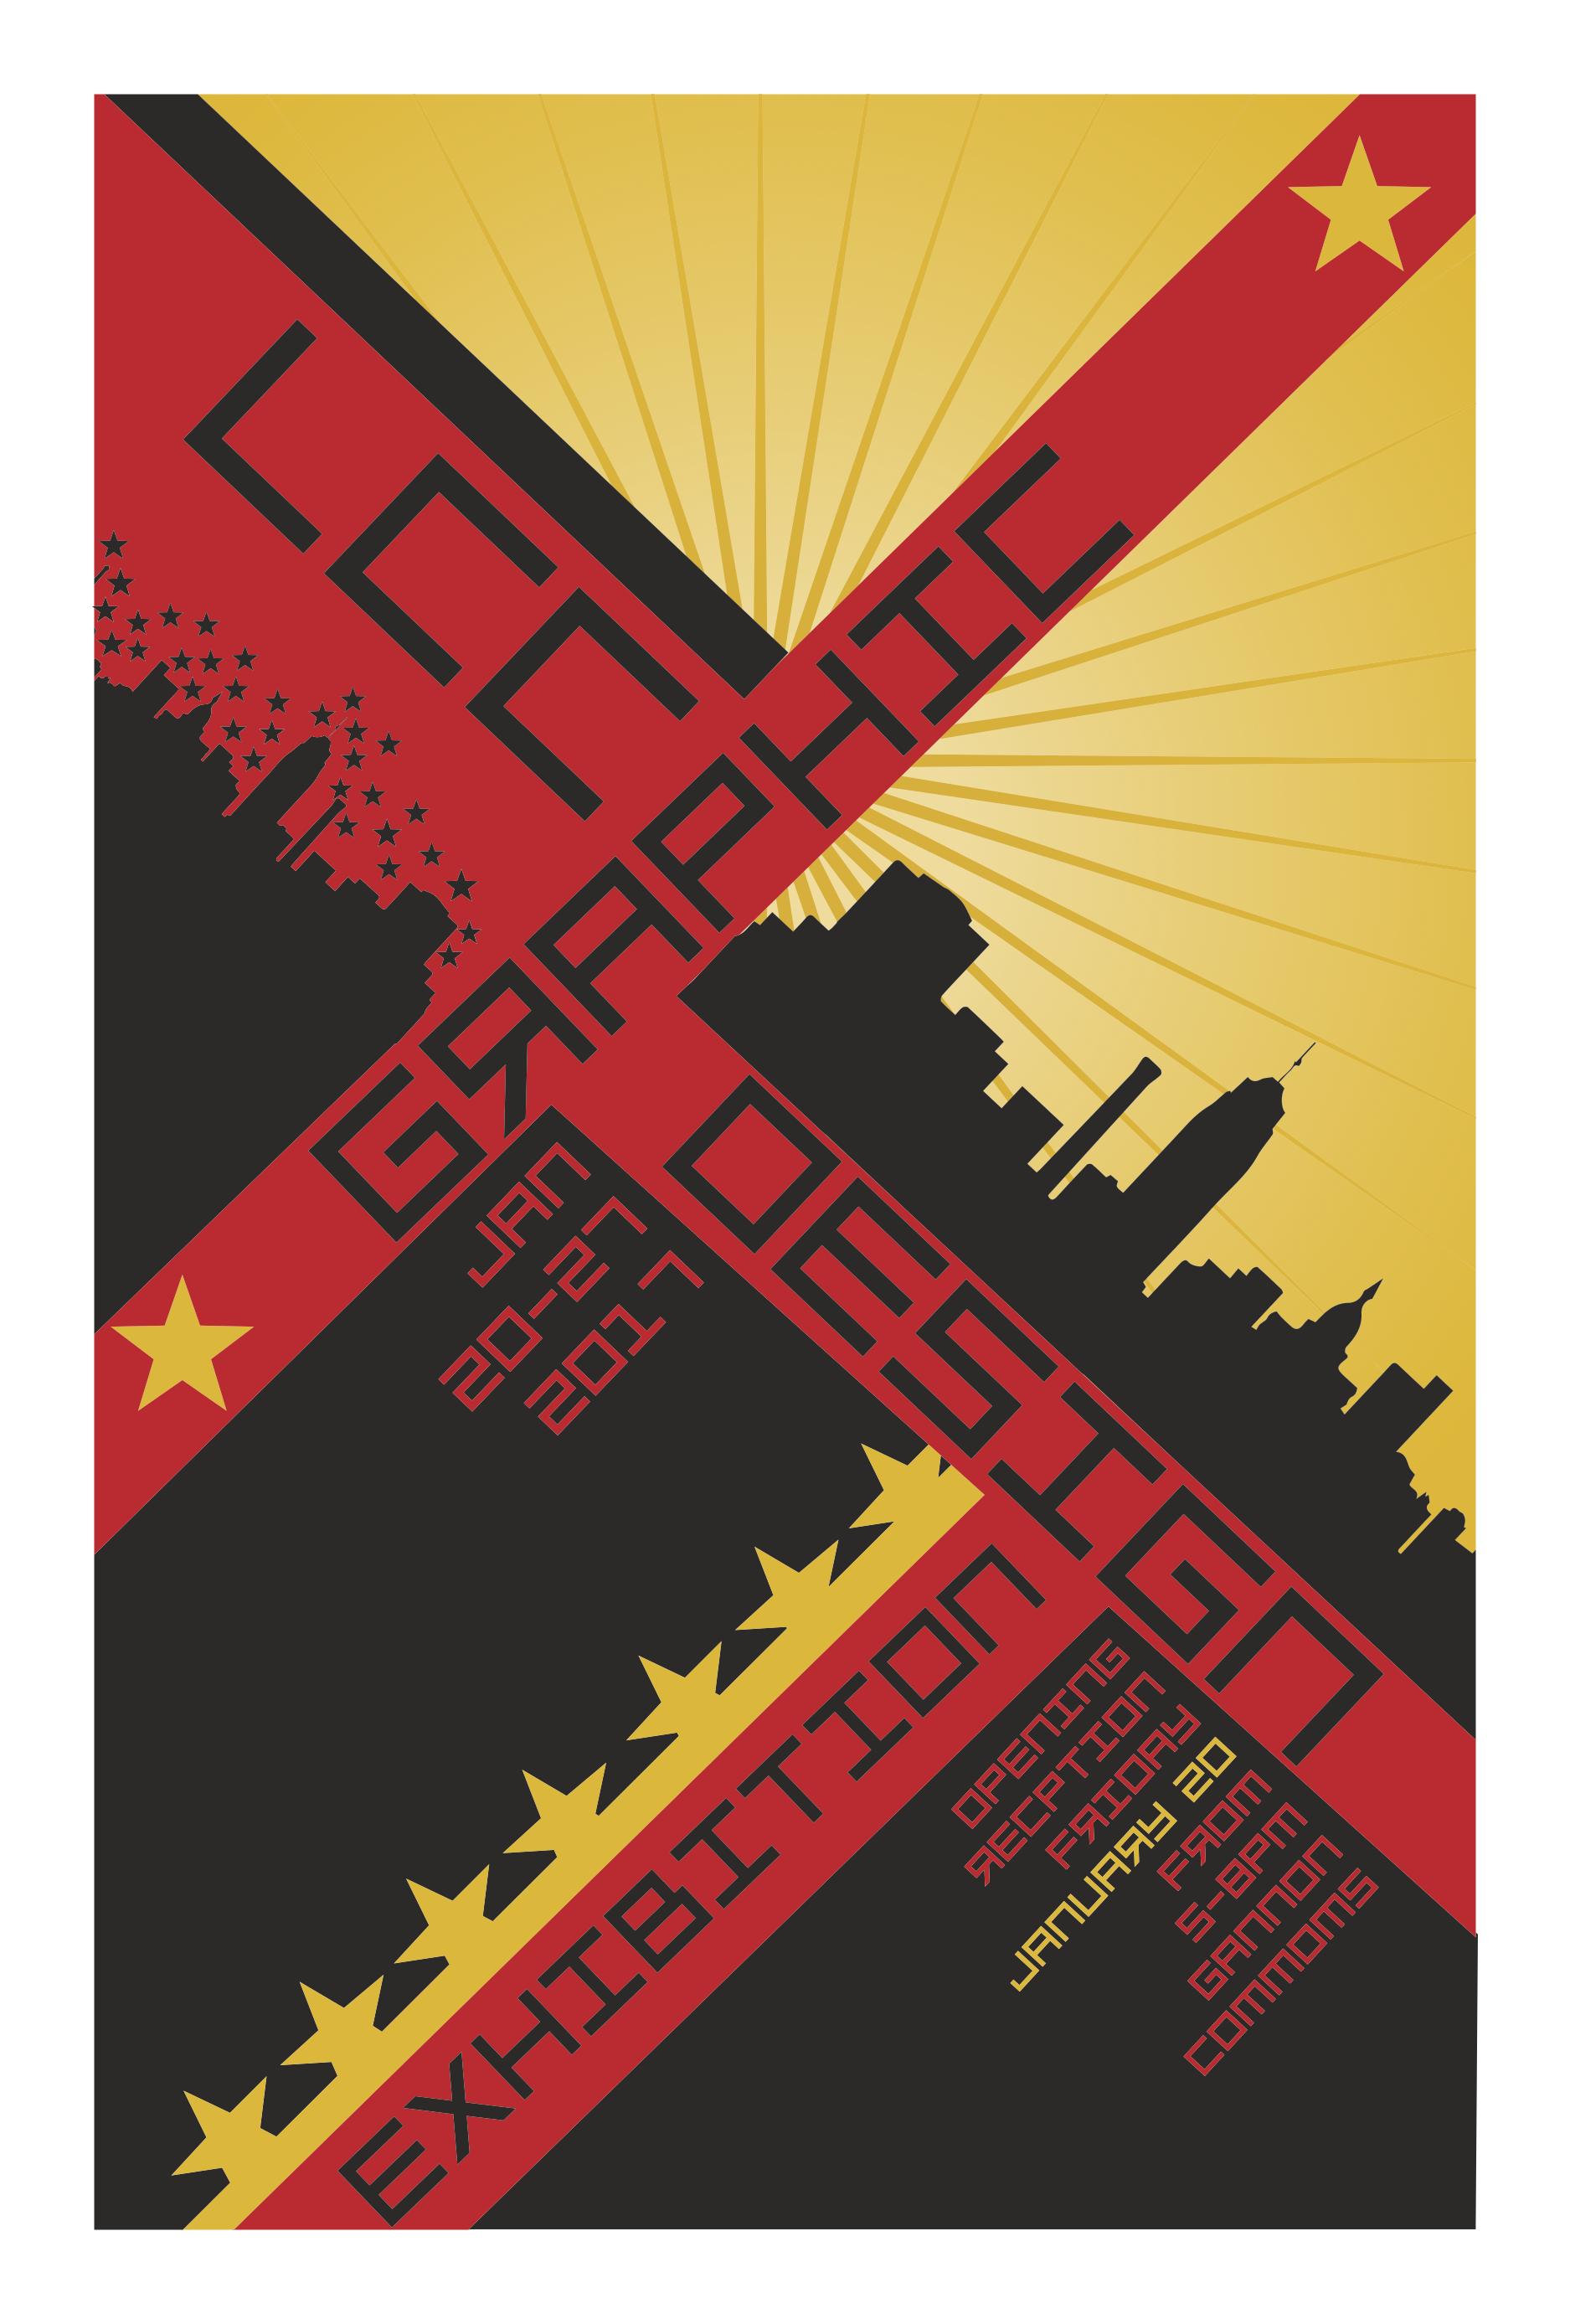 LCC Graphic Design Exhibition Poster